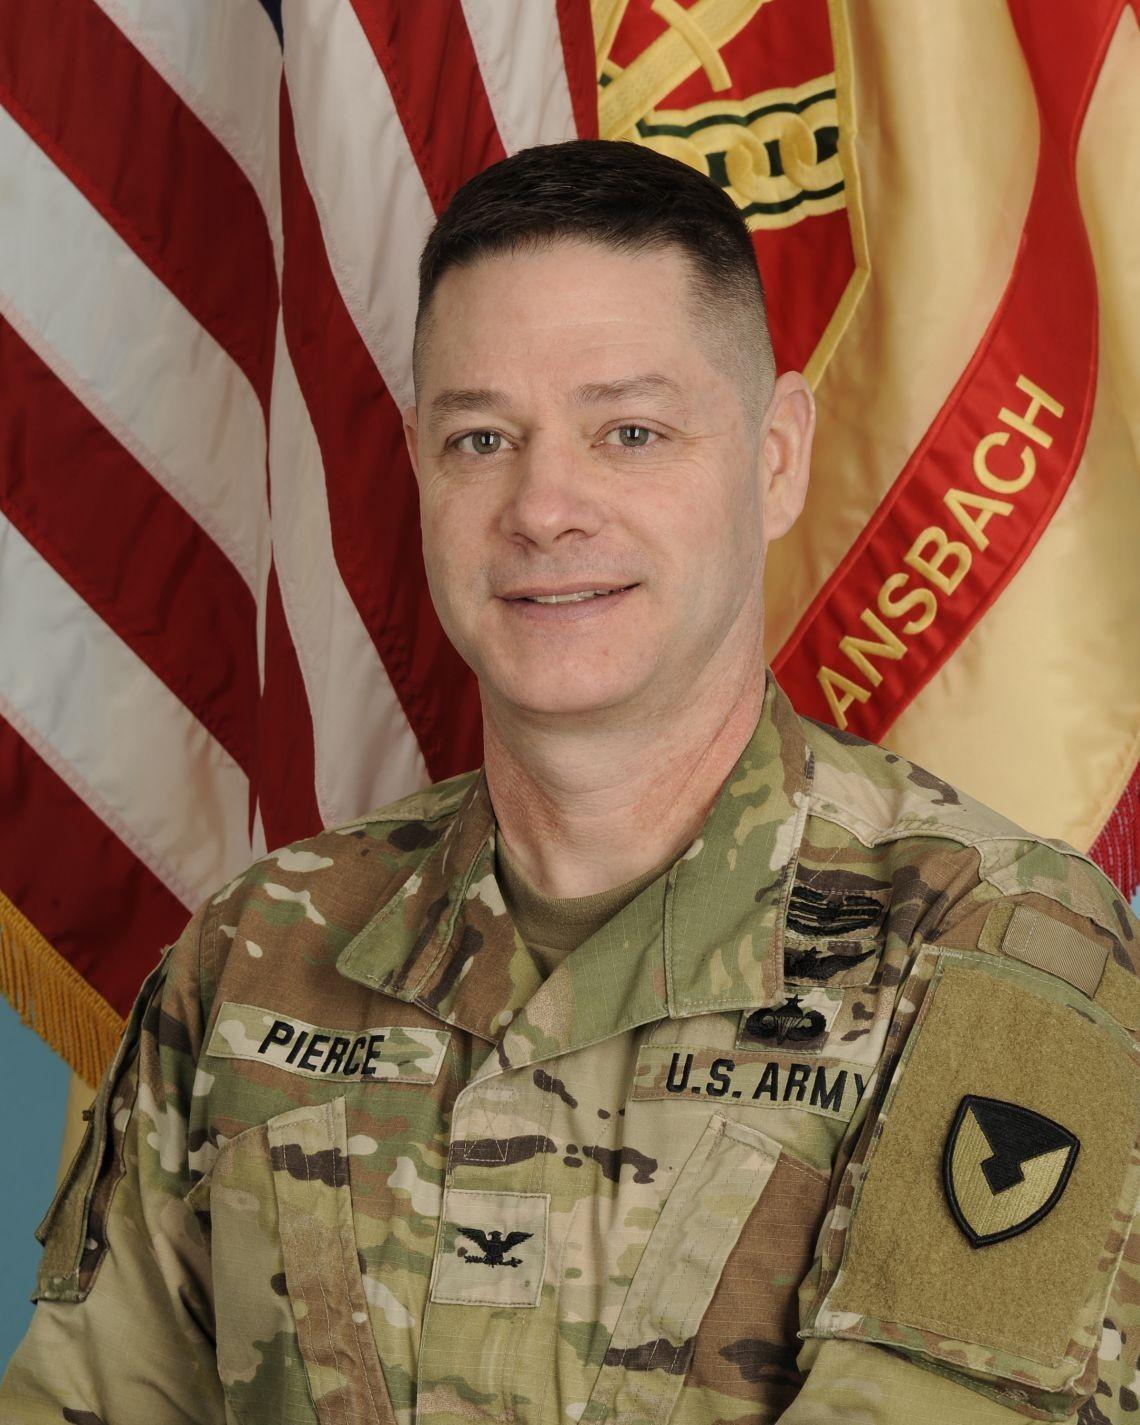 Col. Steven M. Pierce